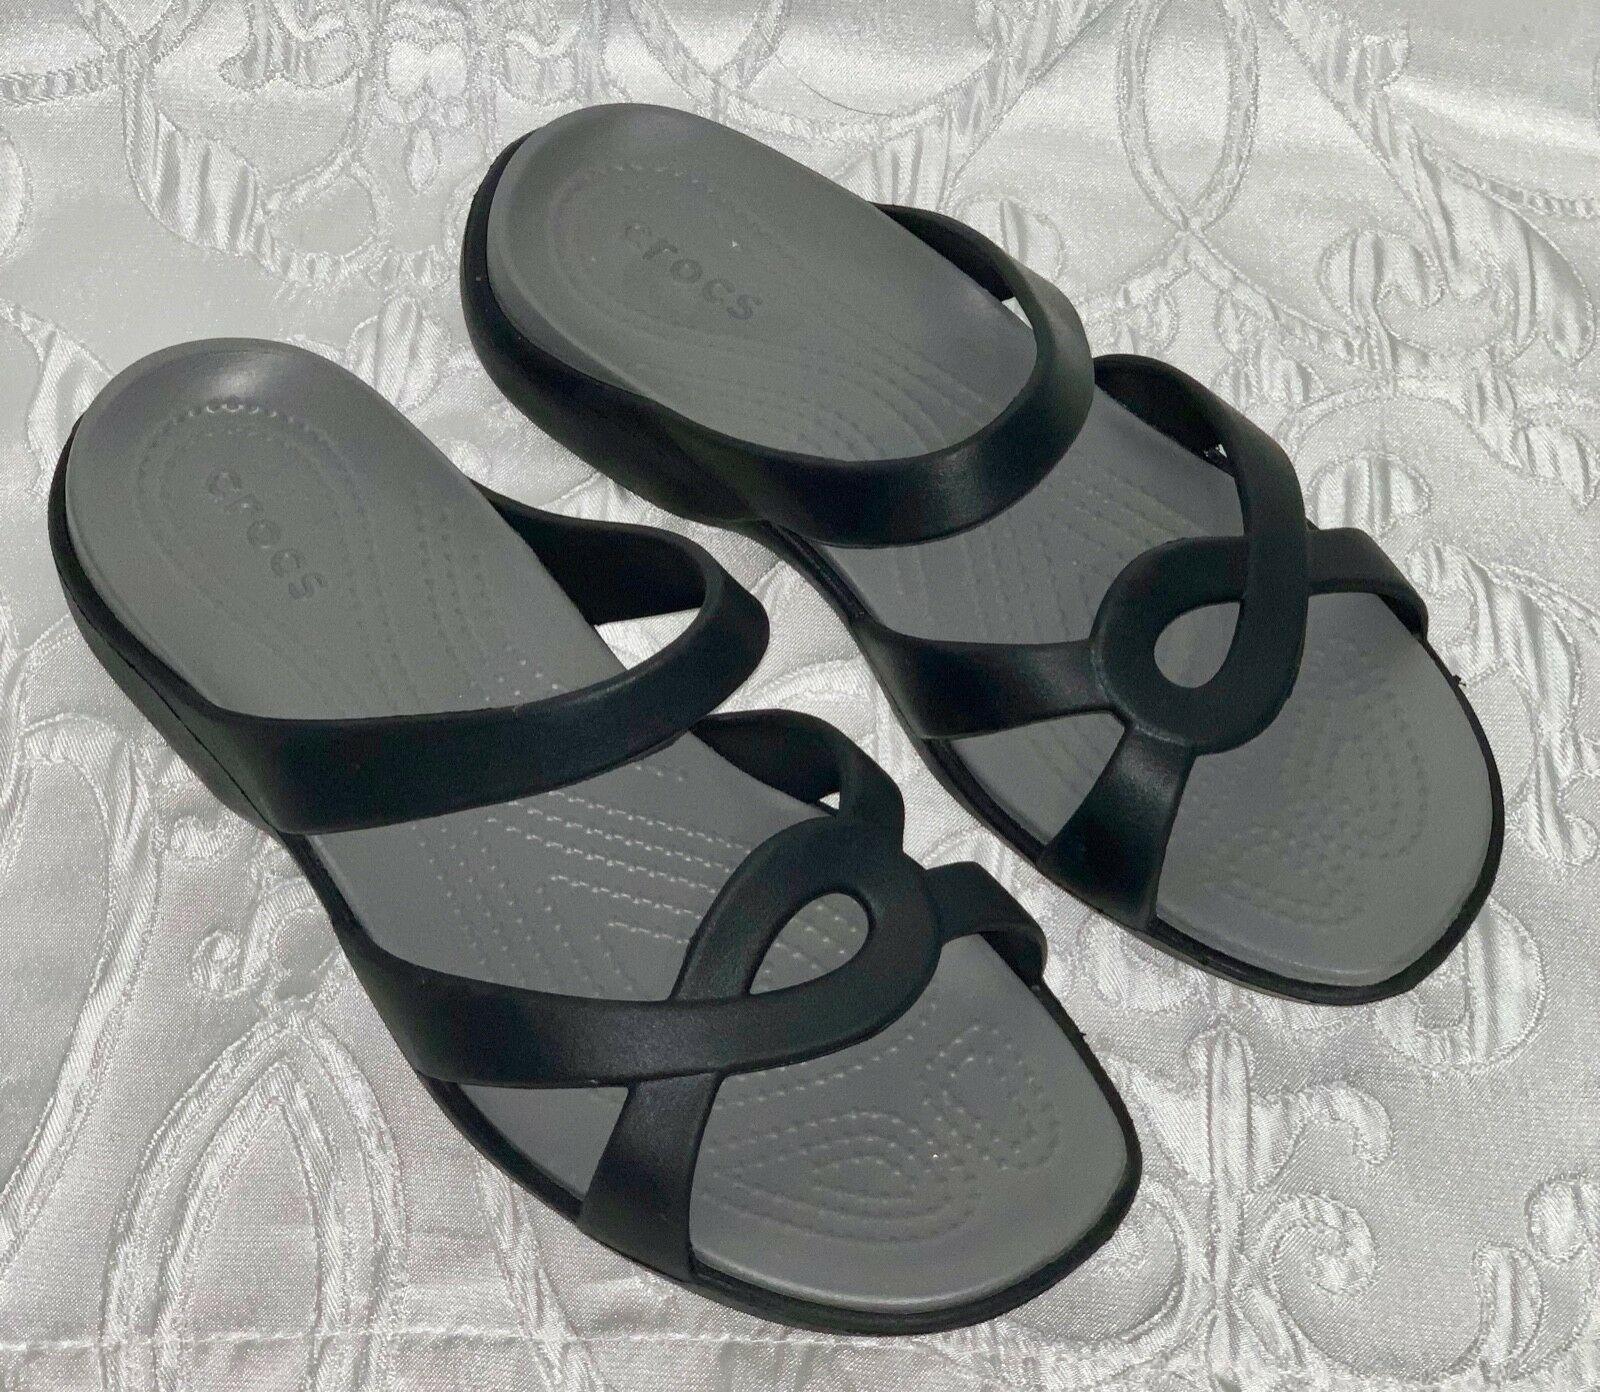 Womens Crocs Black Sandals Slip On Flip Flops Size 9 Nice Shape